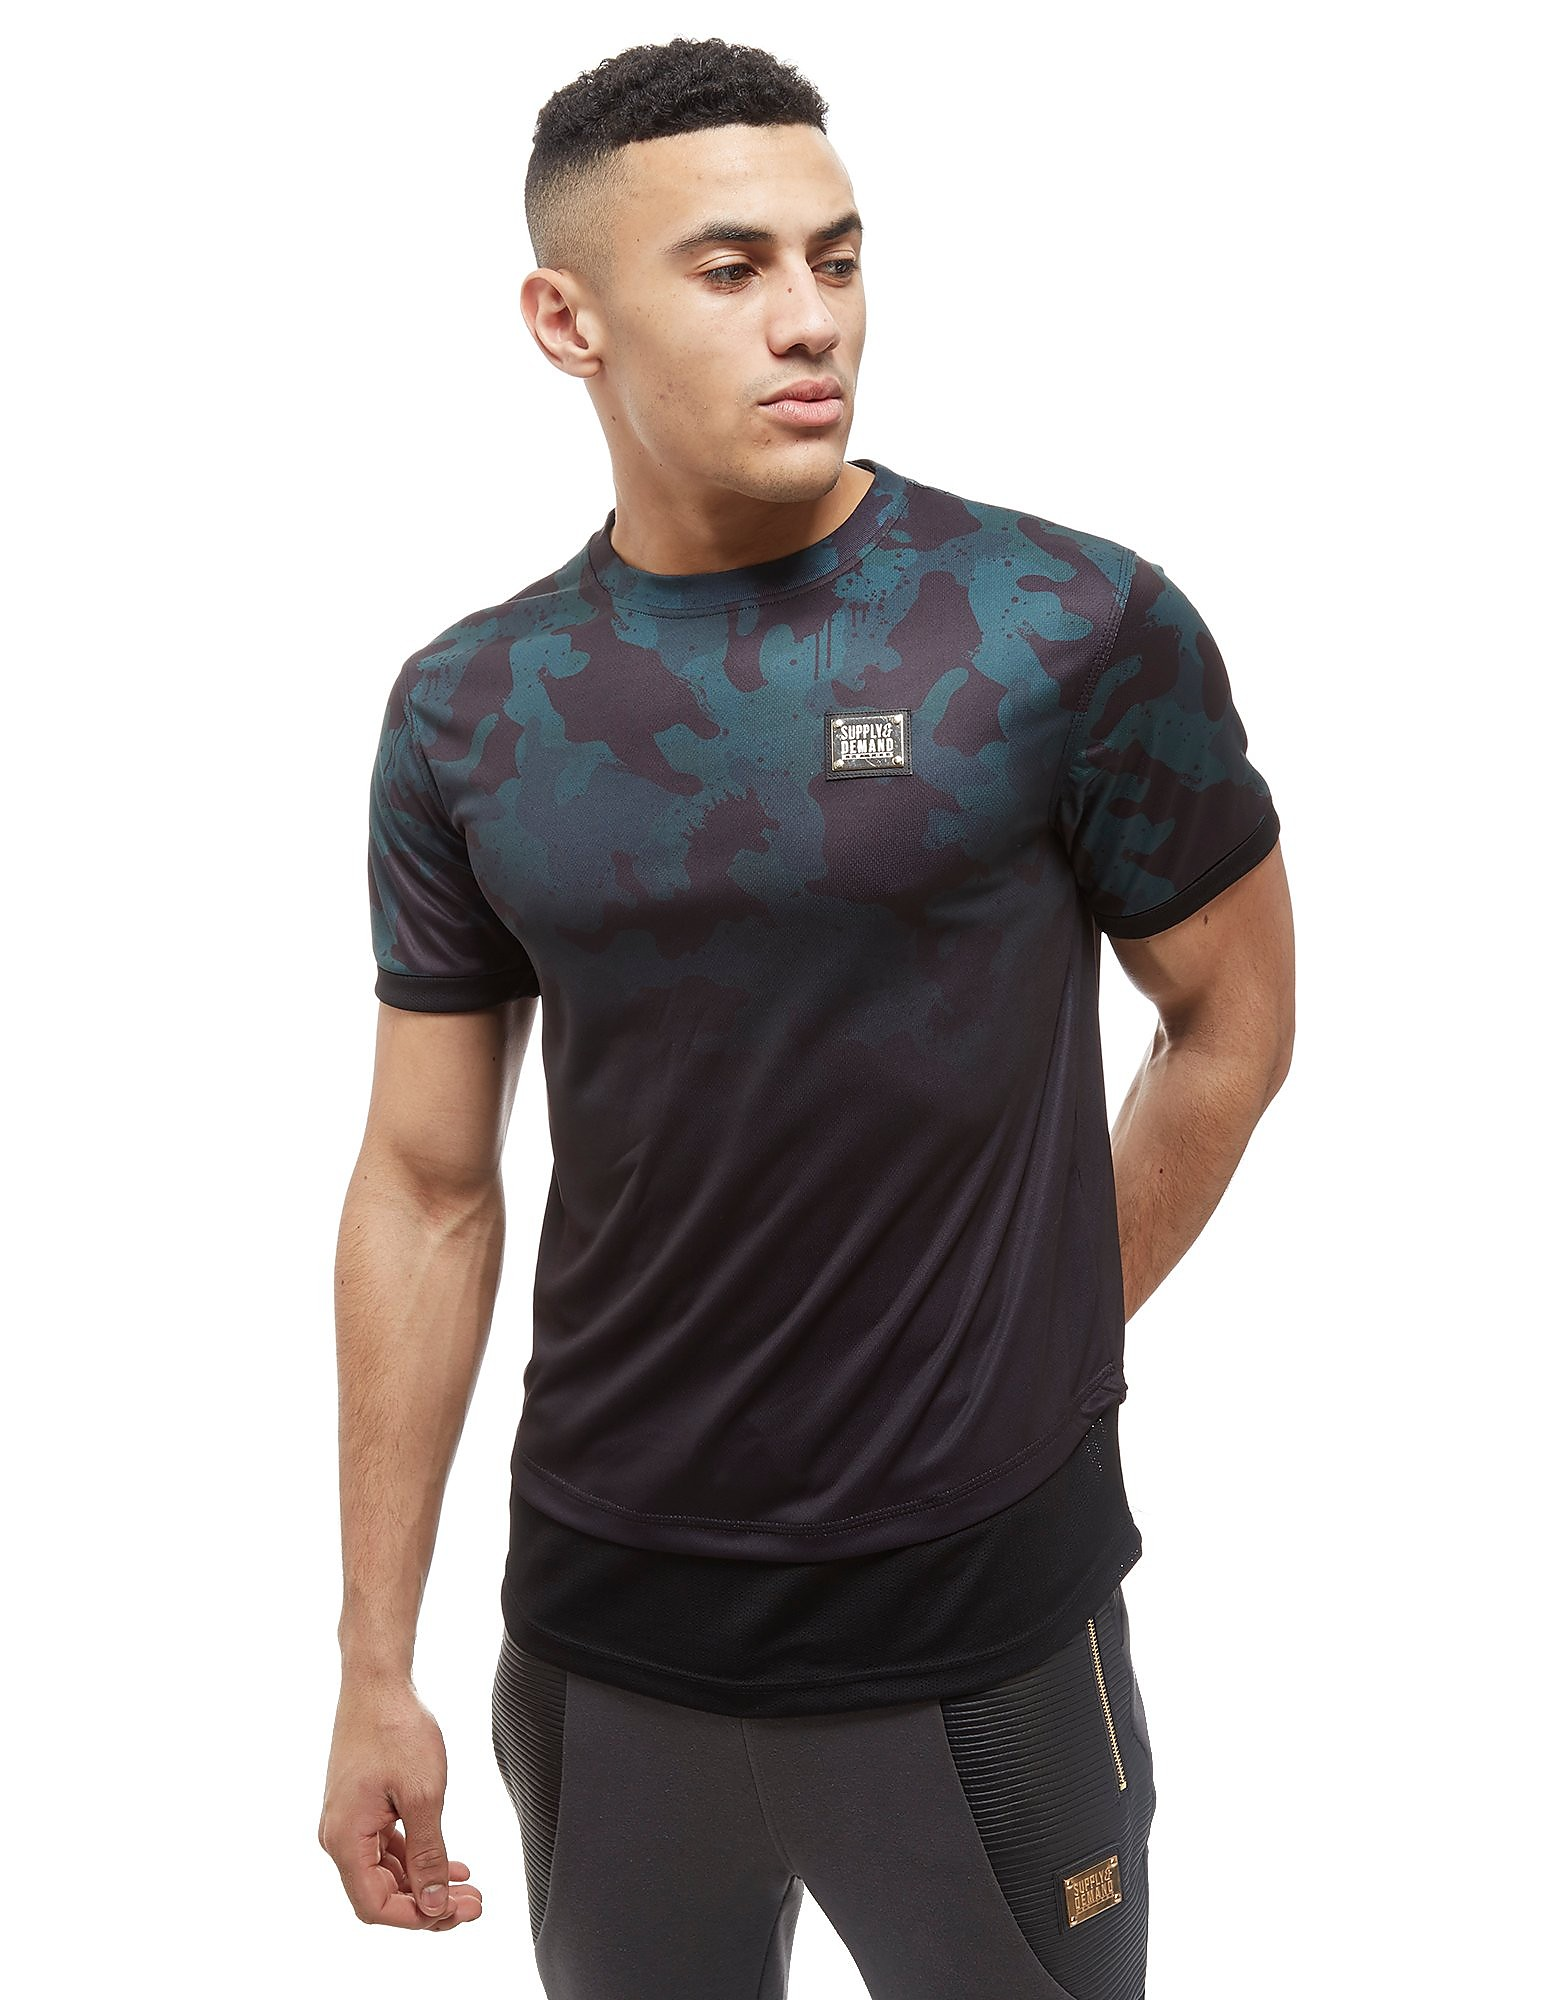 Supply & Demand Teal Fade Camo T-Shirt